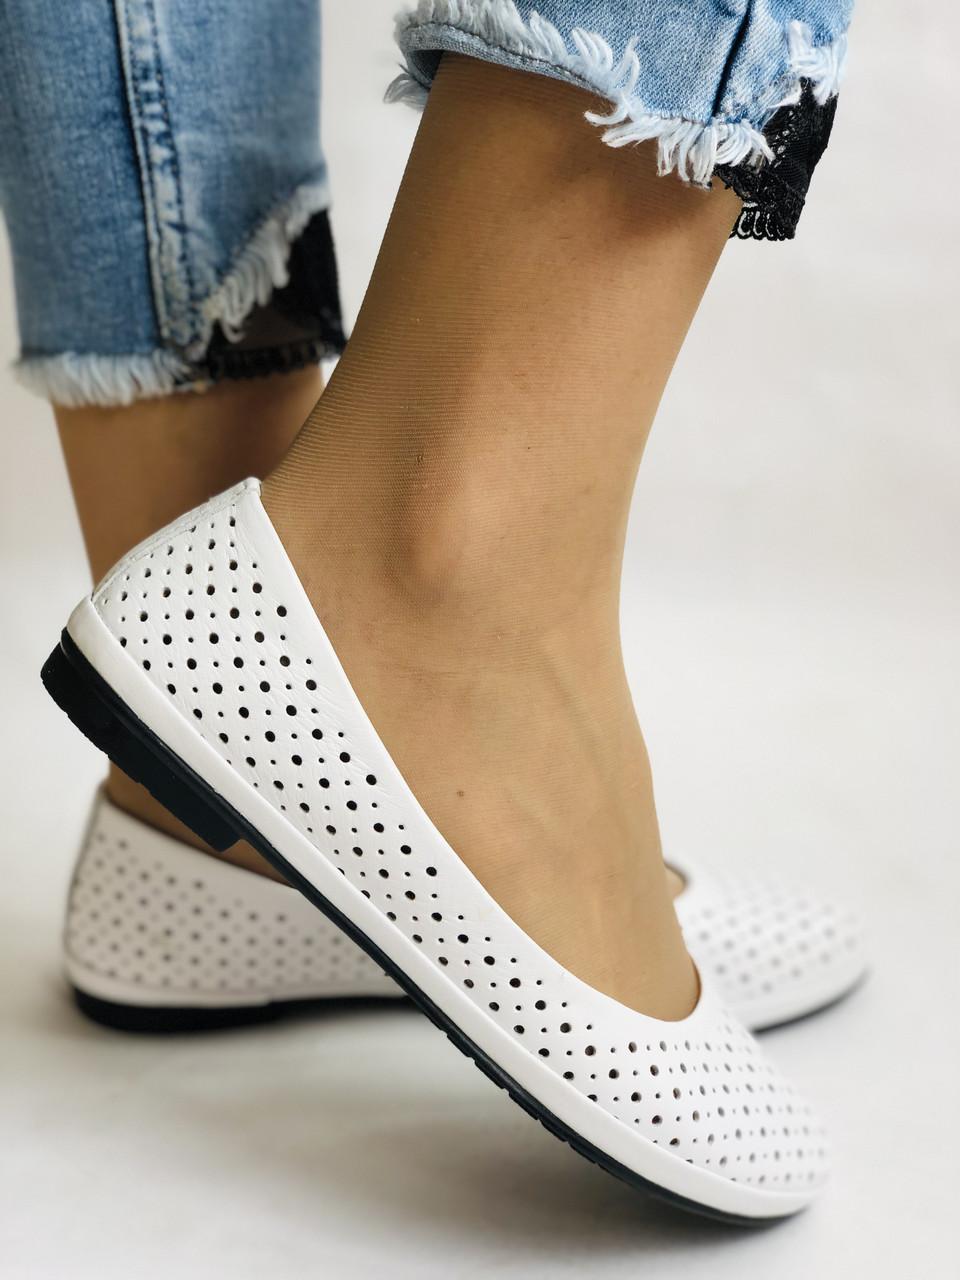 Женские туфли -балетки из натуральной кожи Белый.Размер 36 37 38 39 40 Mario Muzi